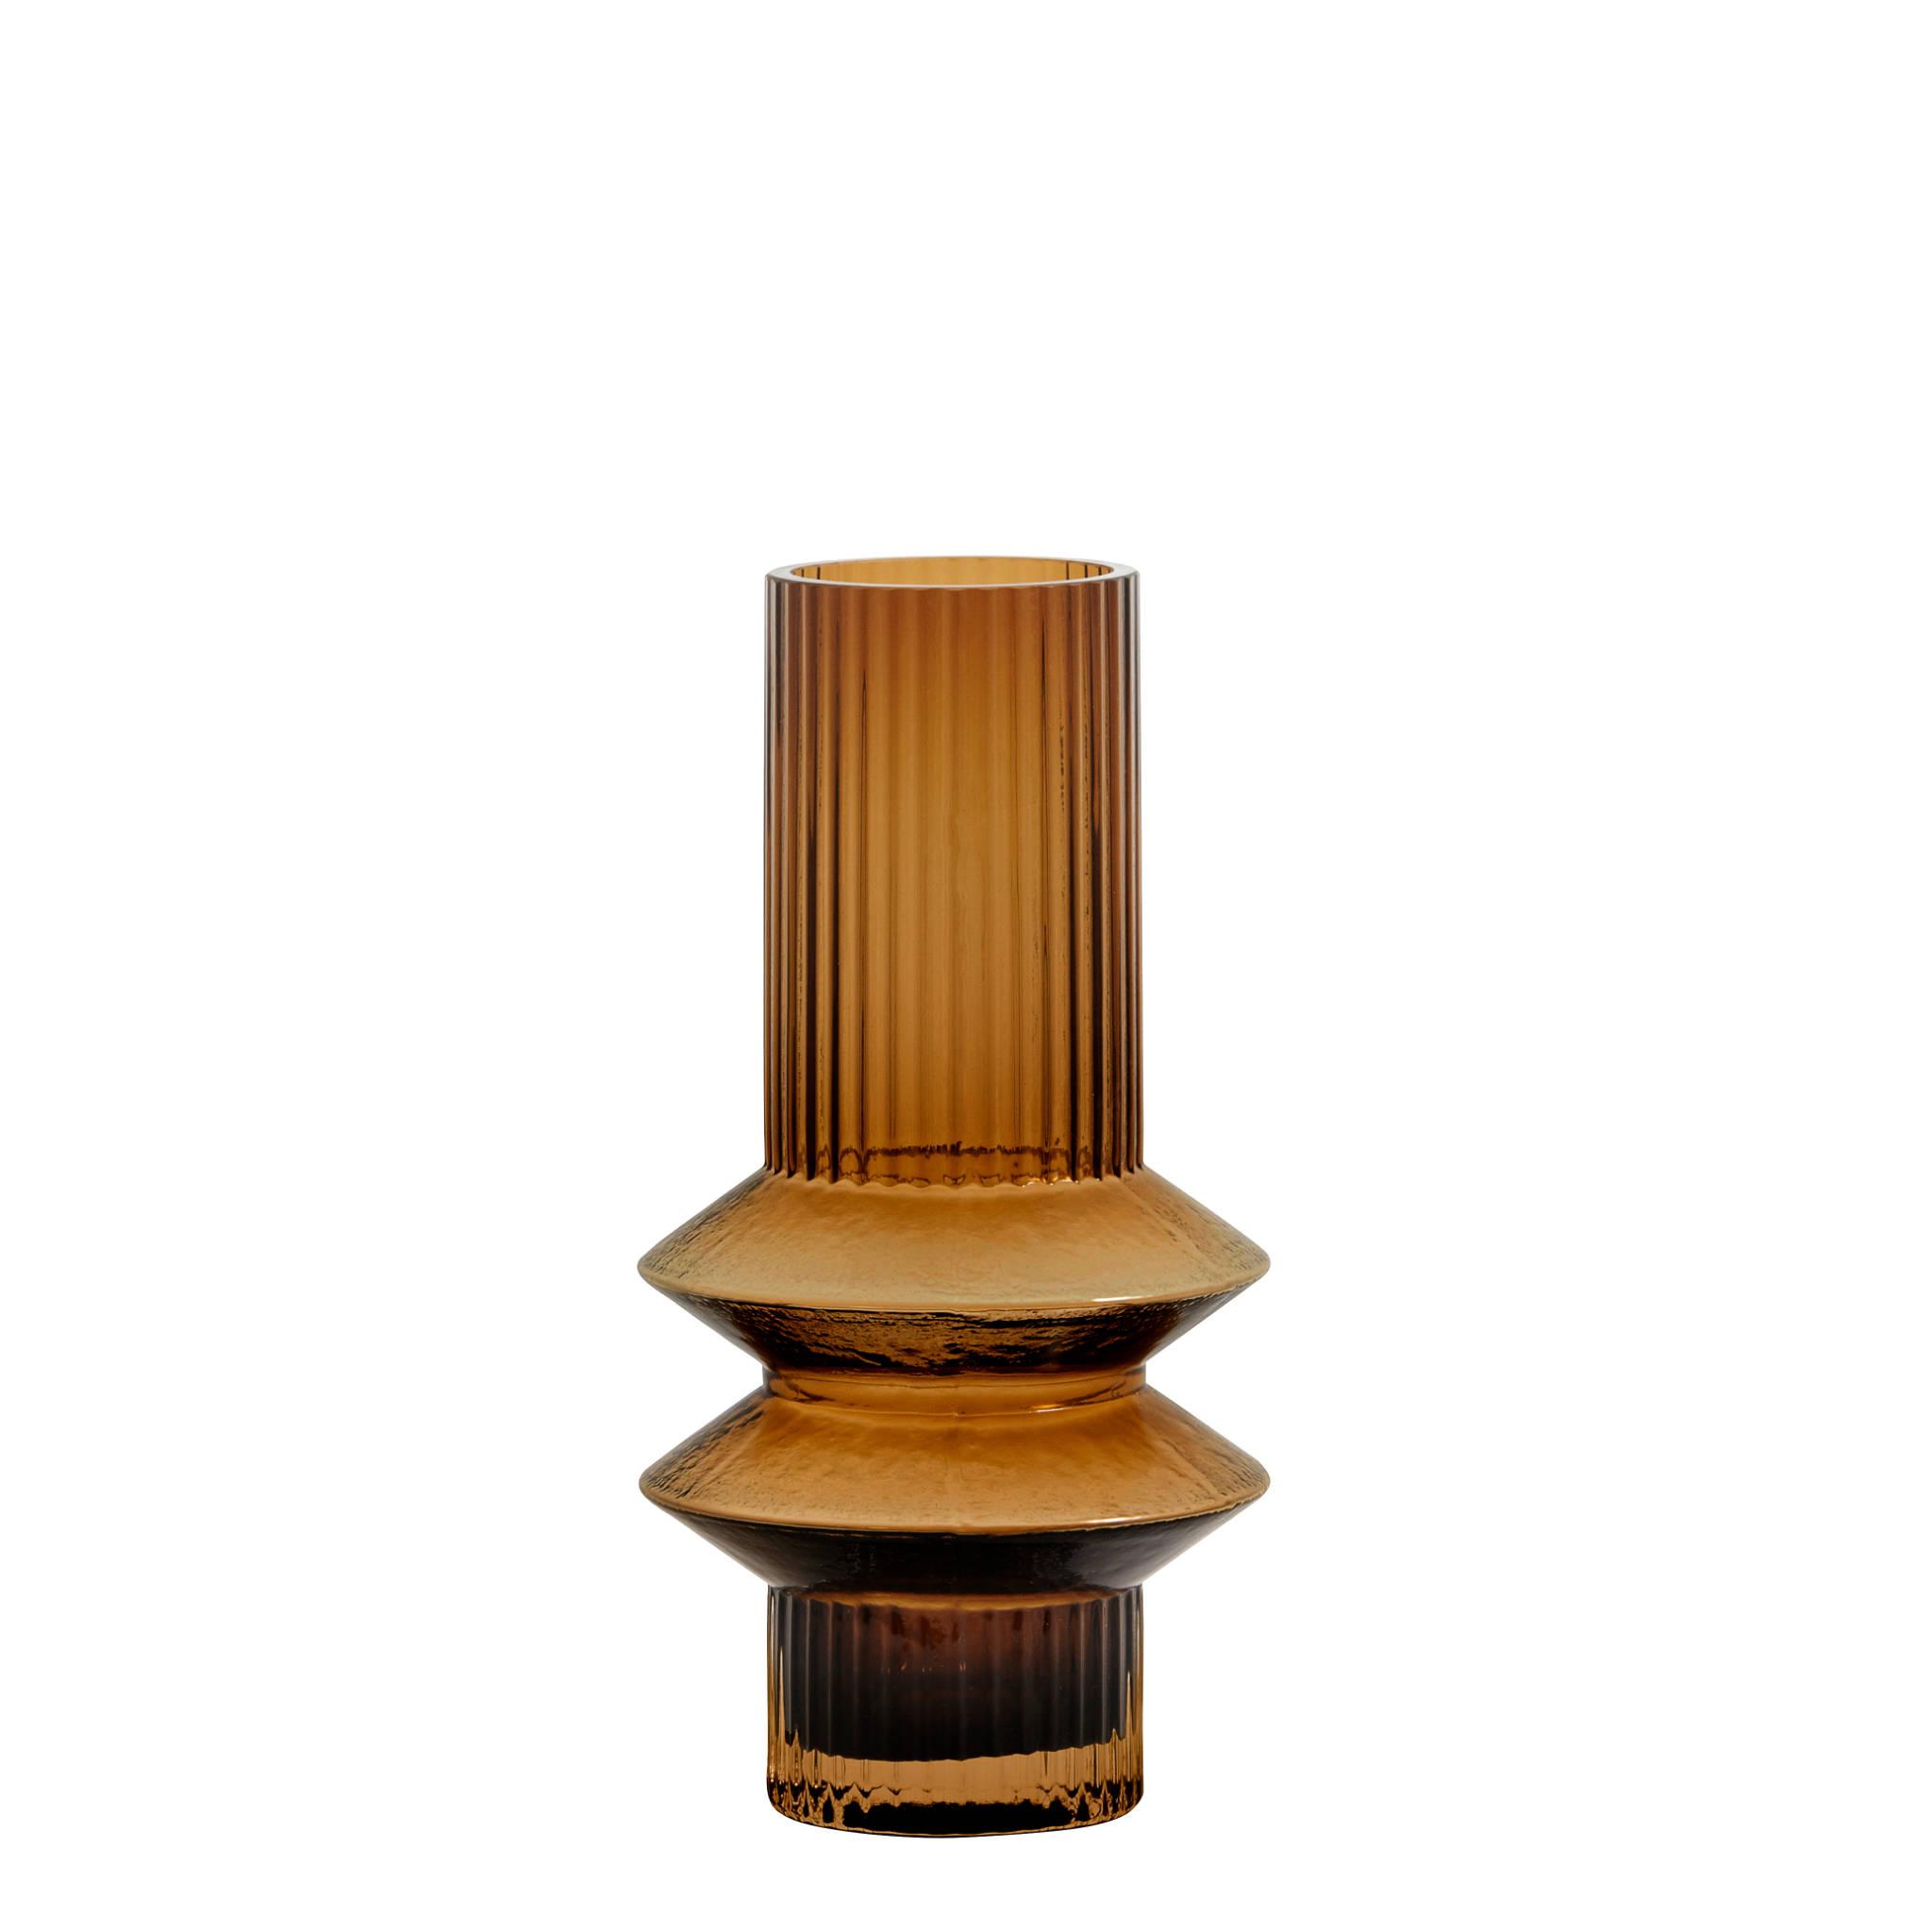 Nordal Rilla Vase- S